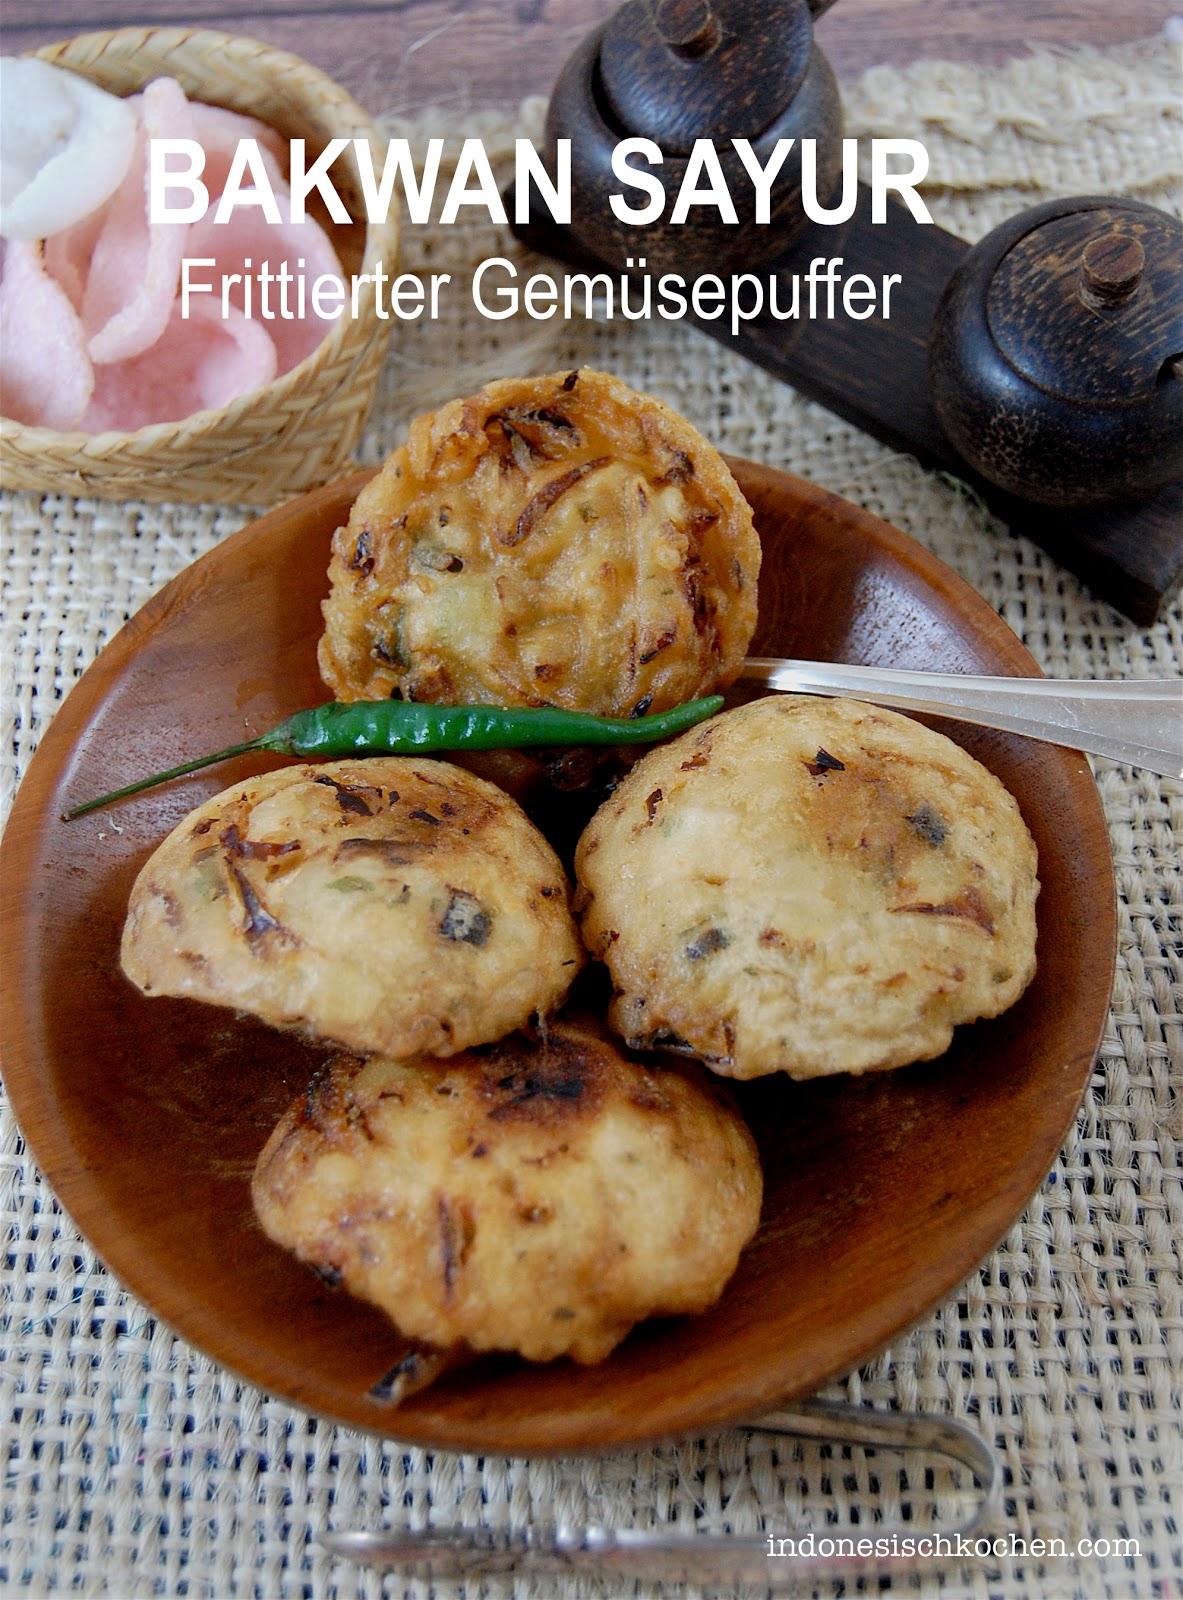 Rezept  Bakwan Sayur, ein Frittierter Gemüsepuffer aus Indonesien